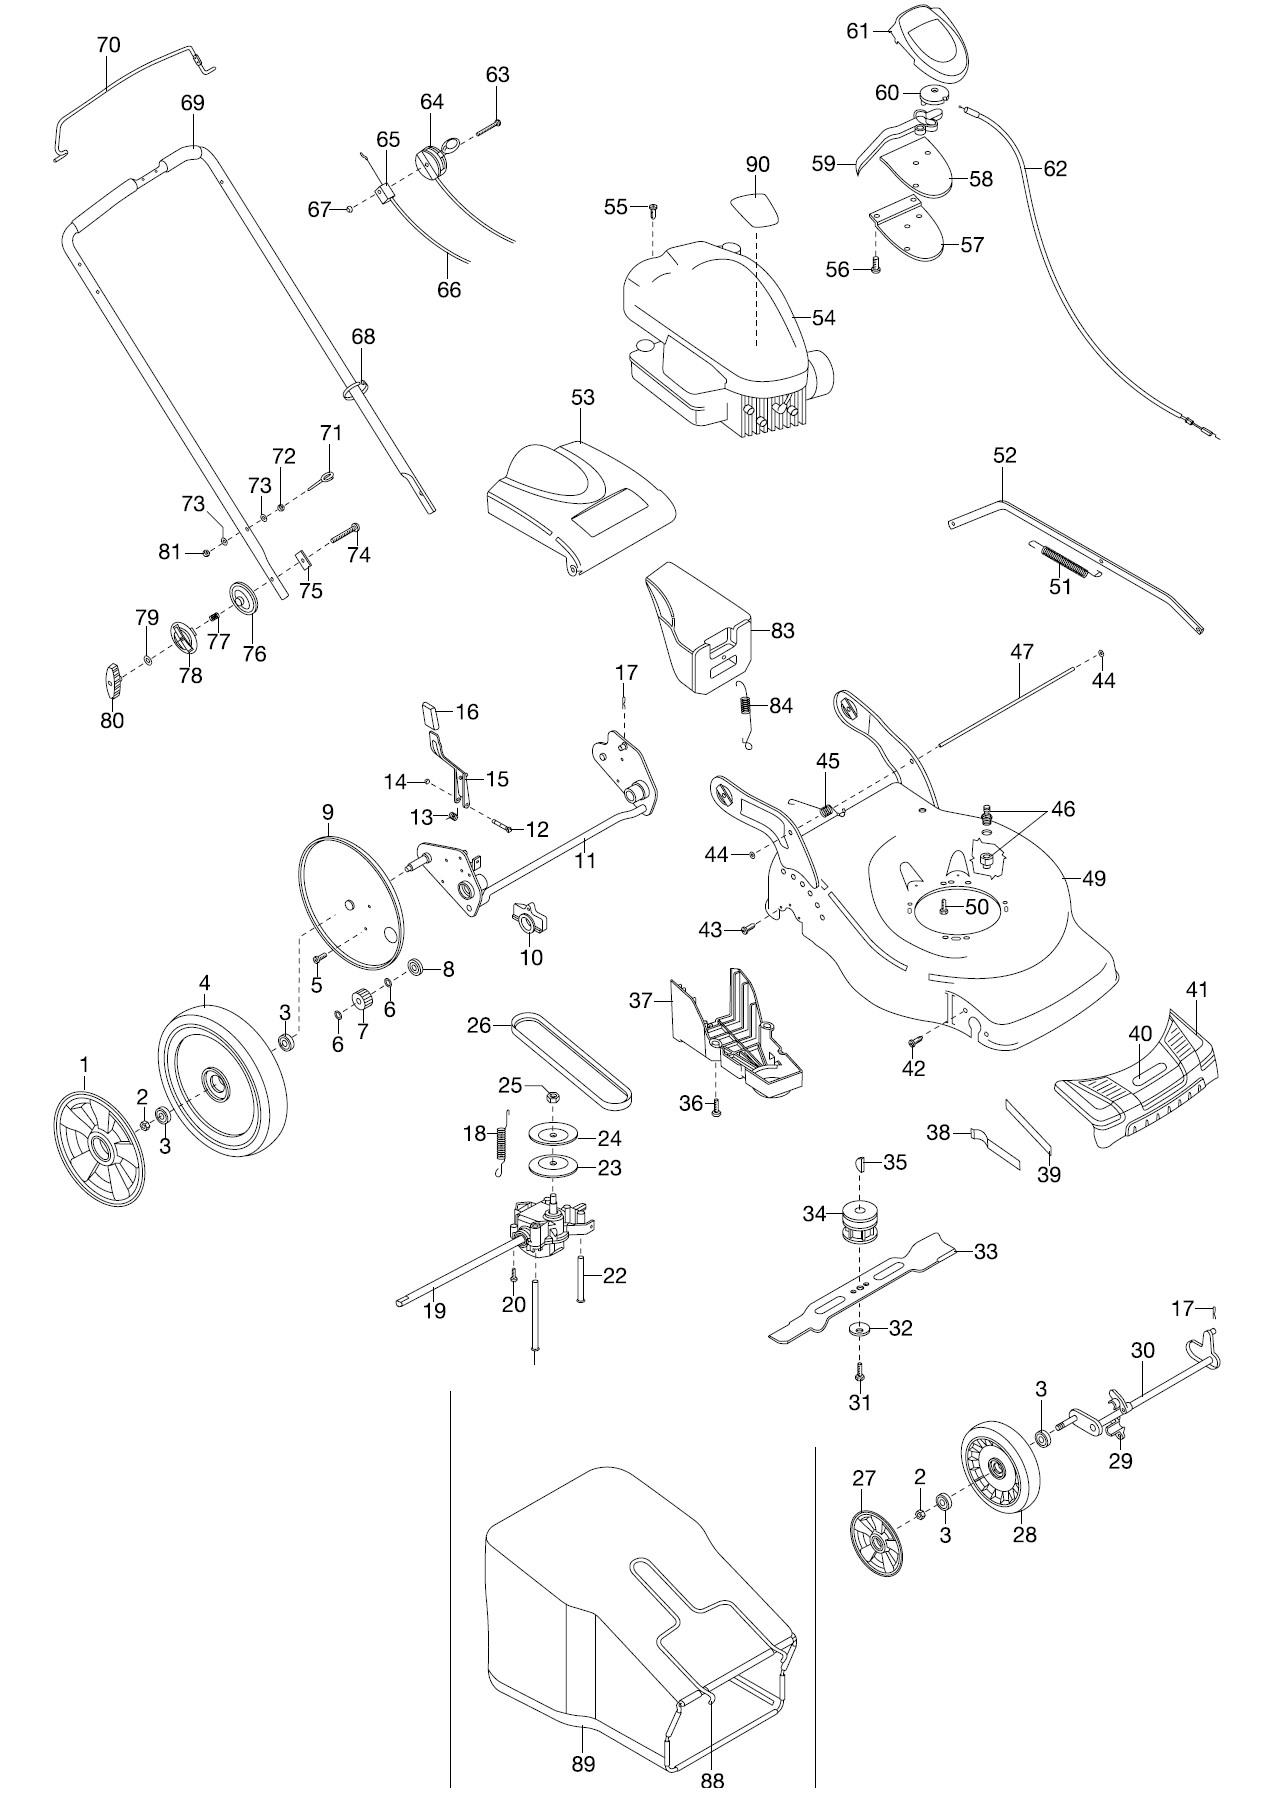 gardena ersatzteile benzin rasenm her 46 vda 4047. Black Bedroom Furniture Sets. Home Design Ideas